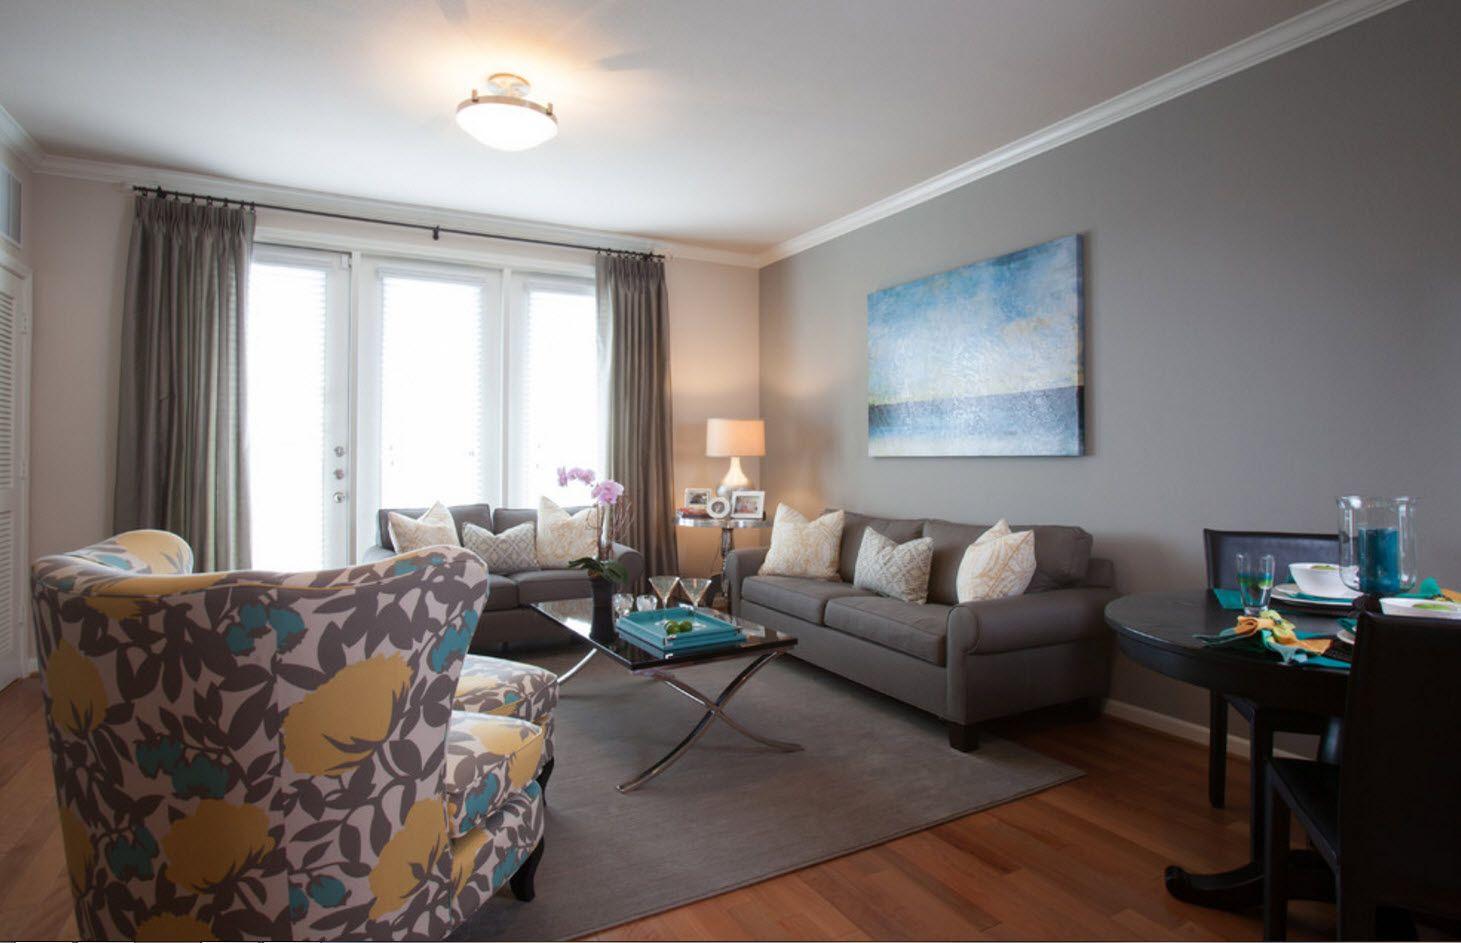 Apartment Interior Design Inspiration Ideas Trends 2017 Trivial Cozy Living Room In